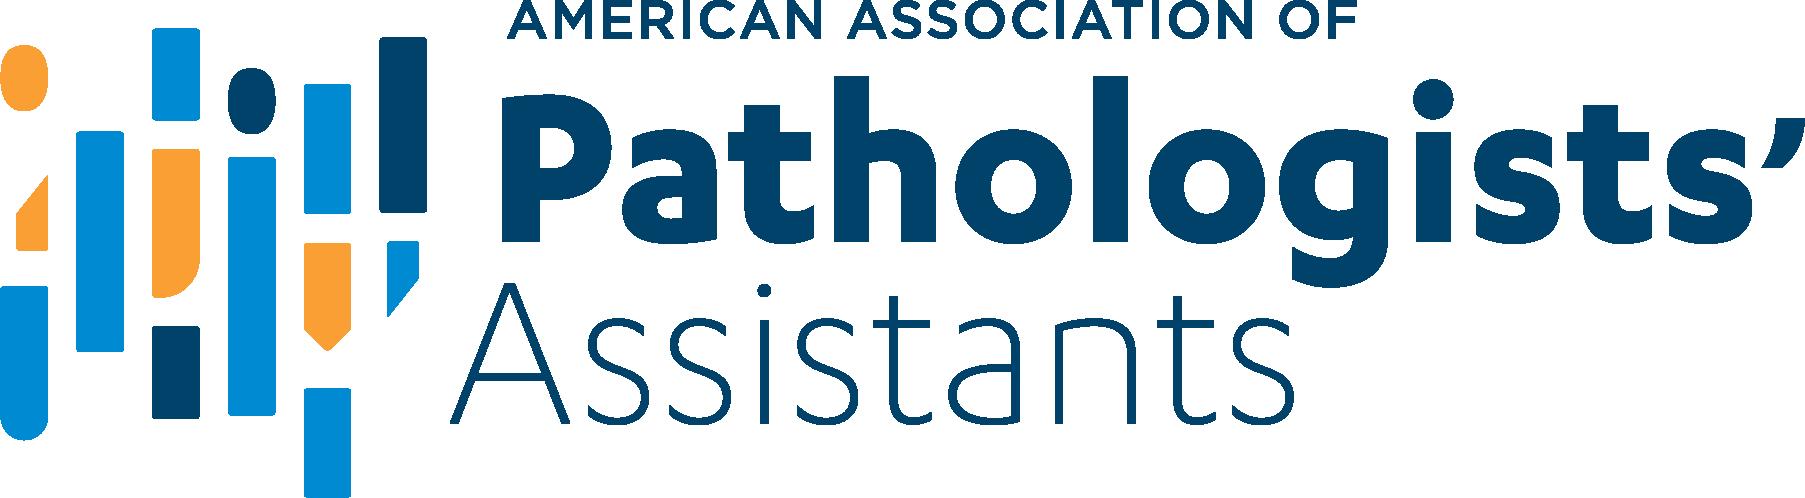 Apply for AAPA Scholarships & Travel Grants - American